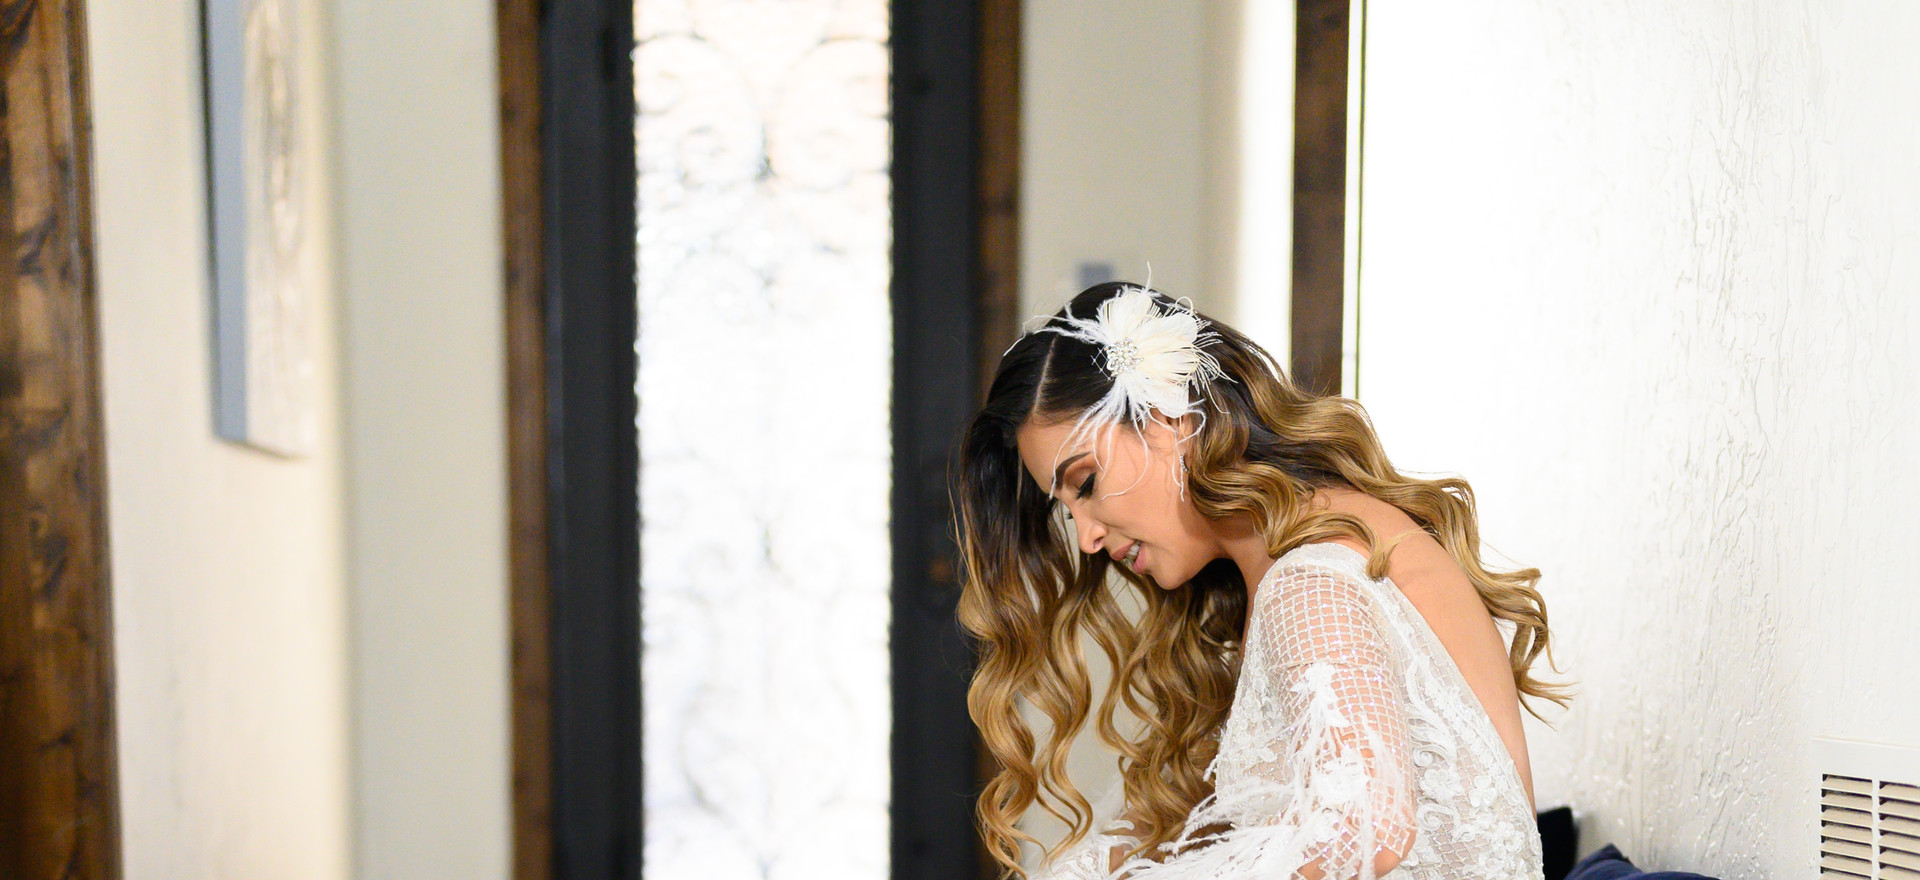 024_Lorena and Mike's Wedding day.jpg